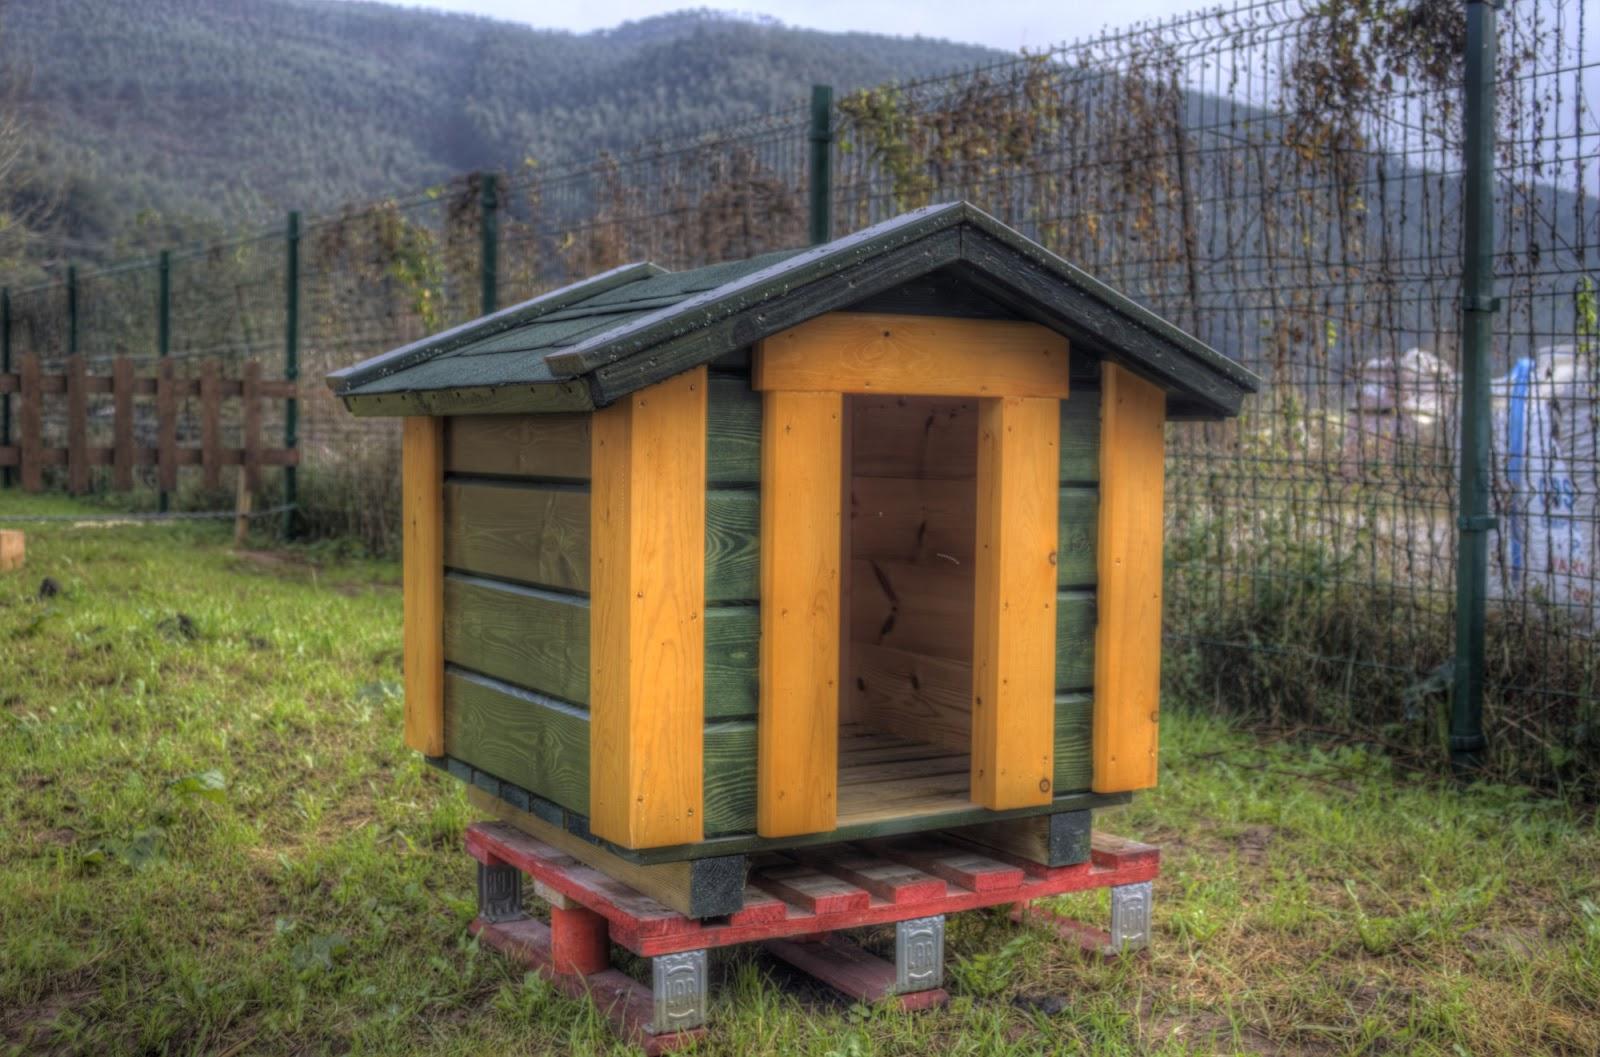 Cantabria loisirs cantabrie loisirs construcciones en - Maderas cantabria ...